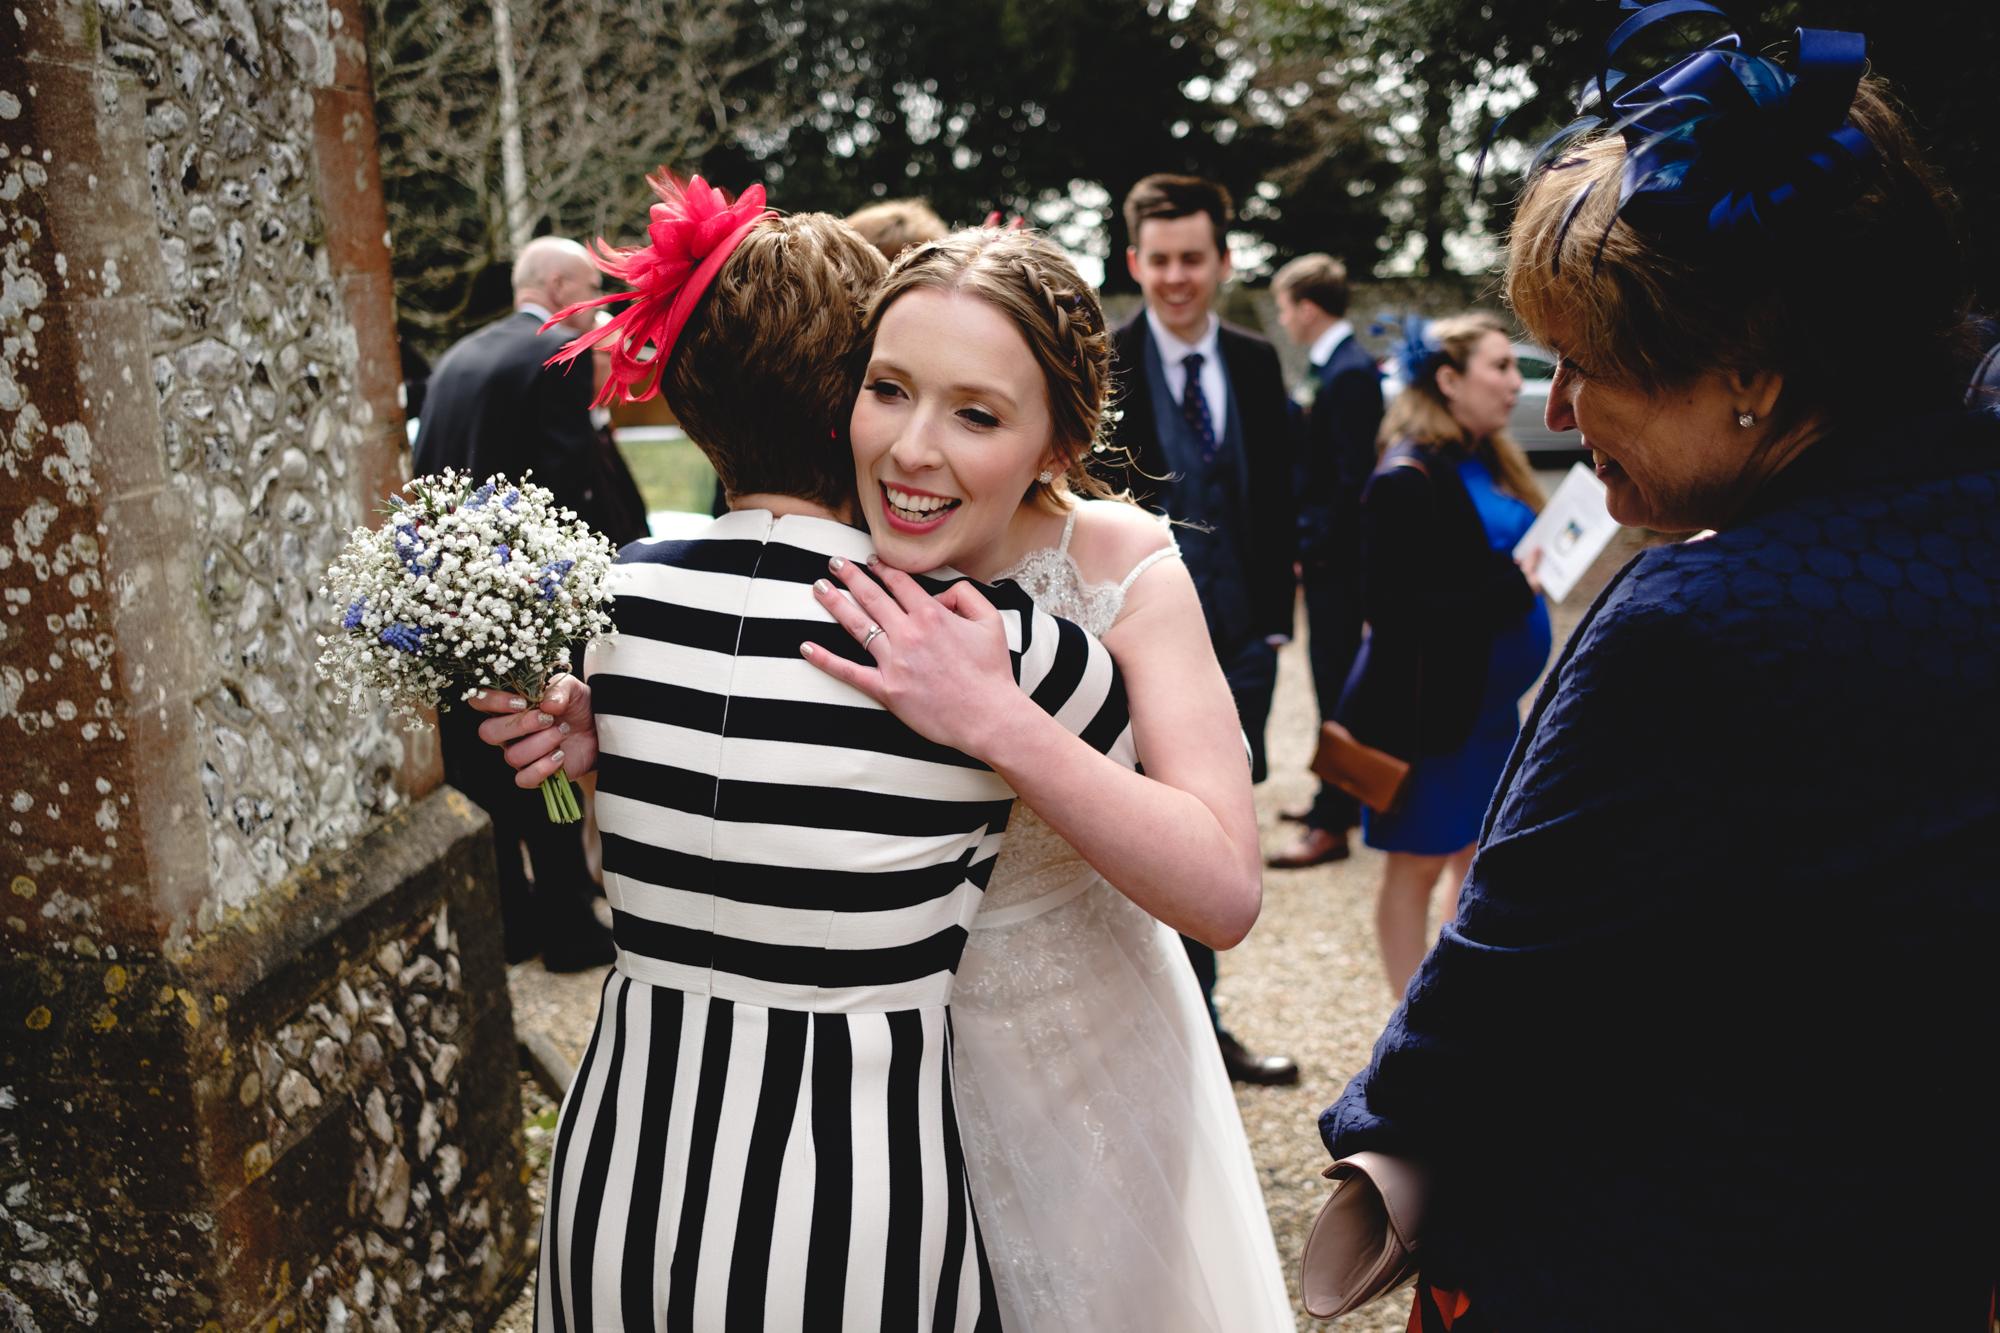 Katie and Dode weddings (103 of 207).jpg